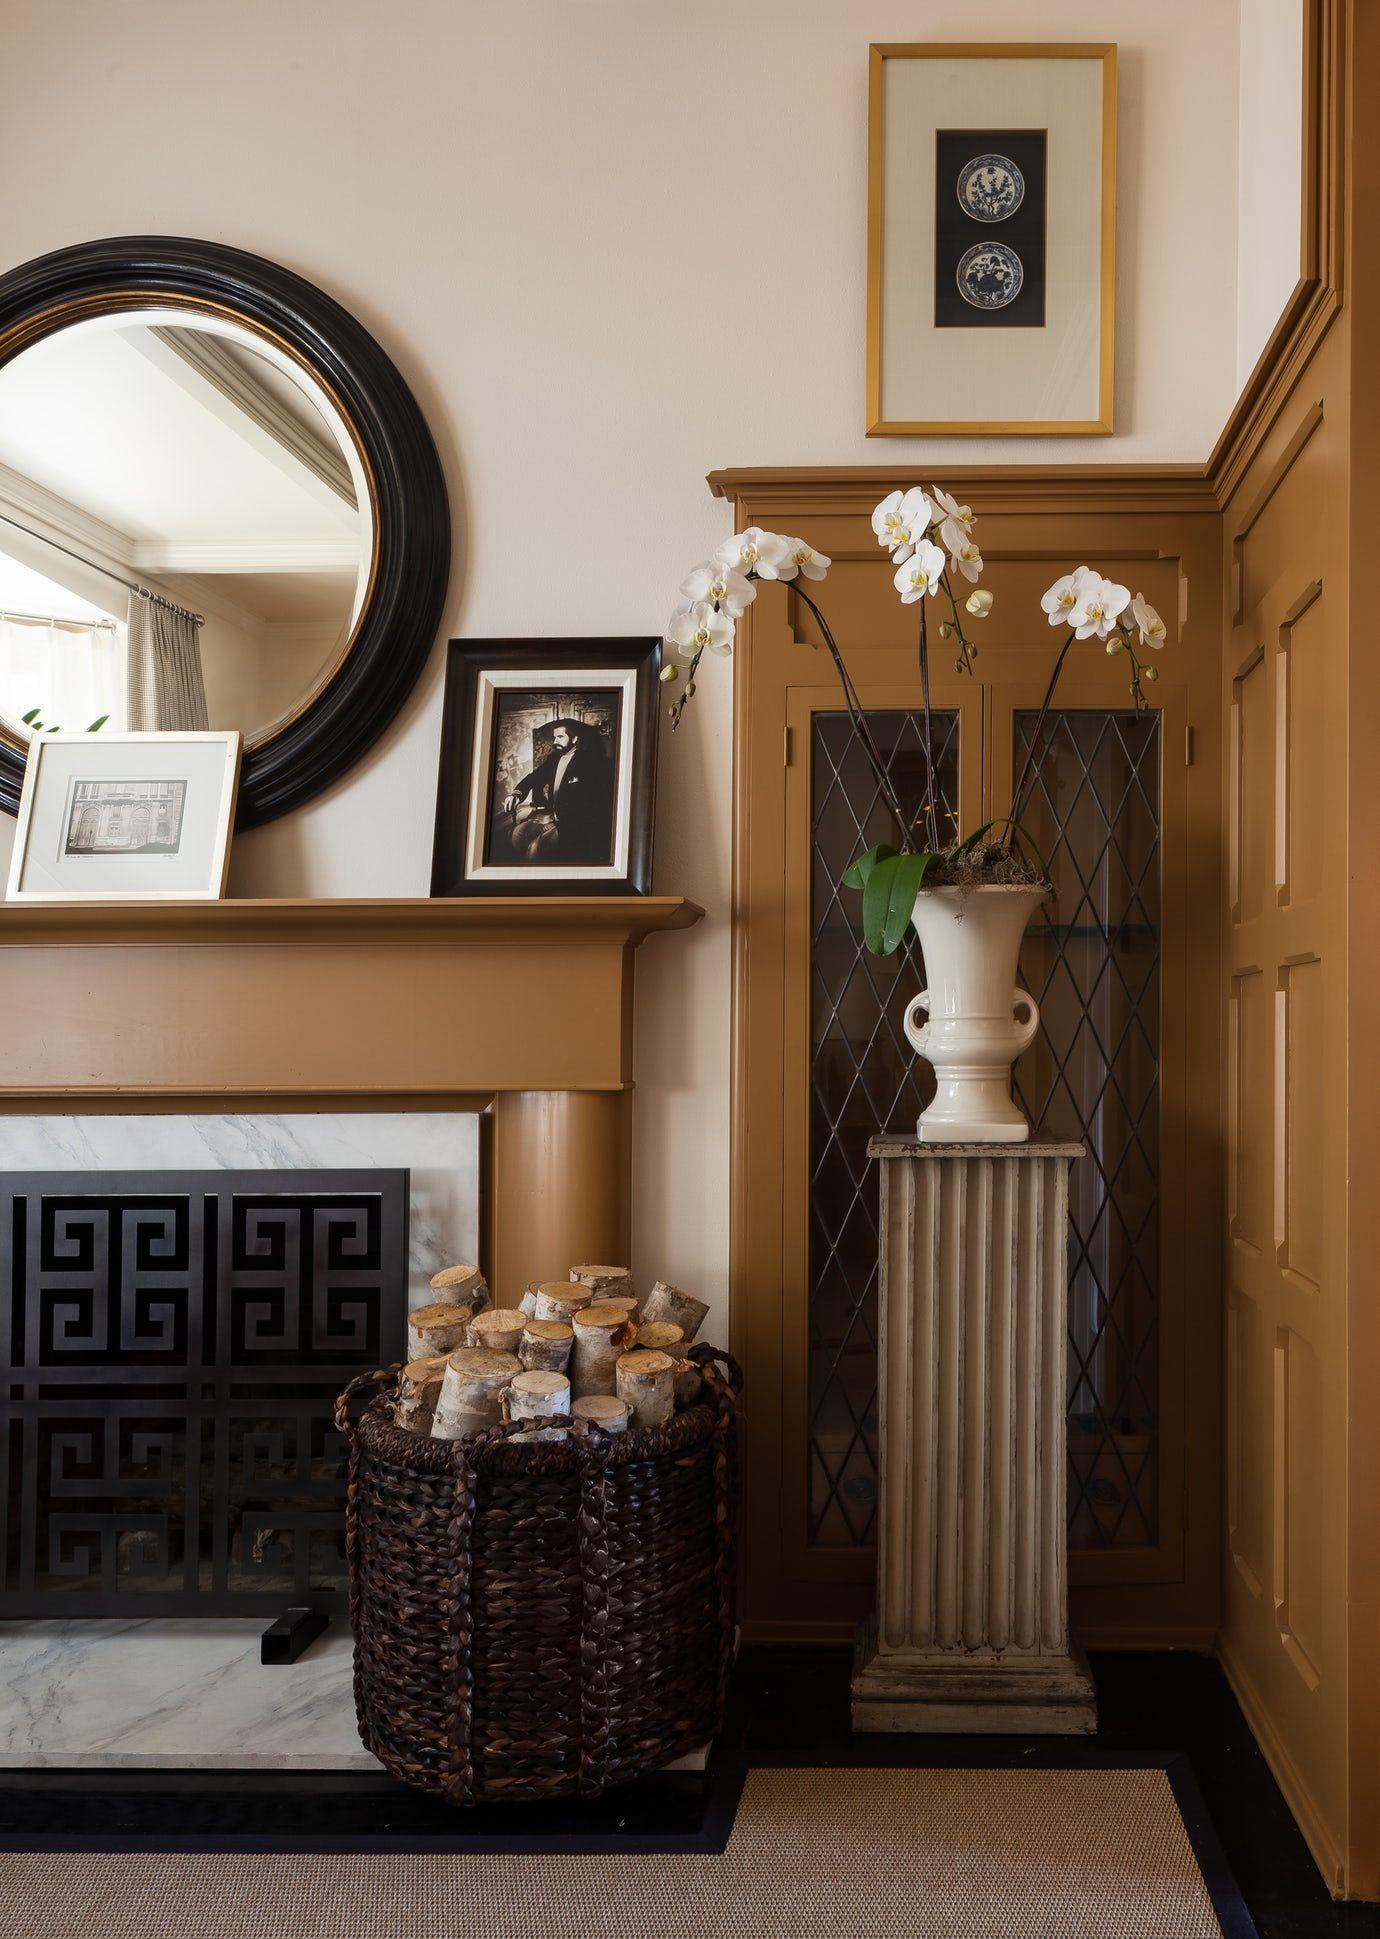 Luxury Showcase For Living Room Royal Art Deco: 2017 Pasadena Showcase House Of Design Library Living